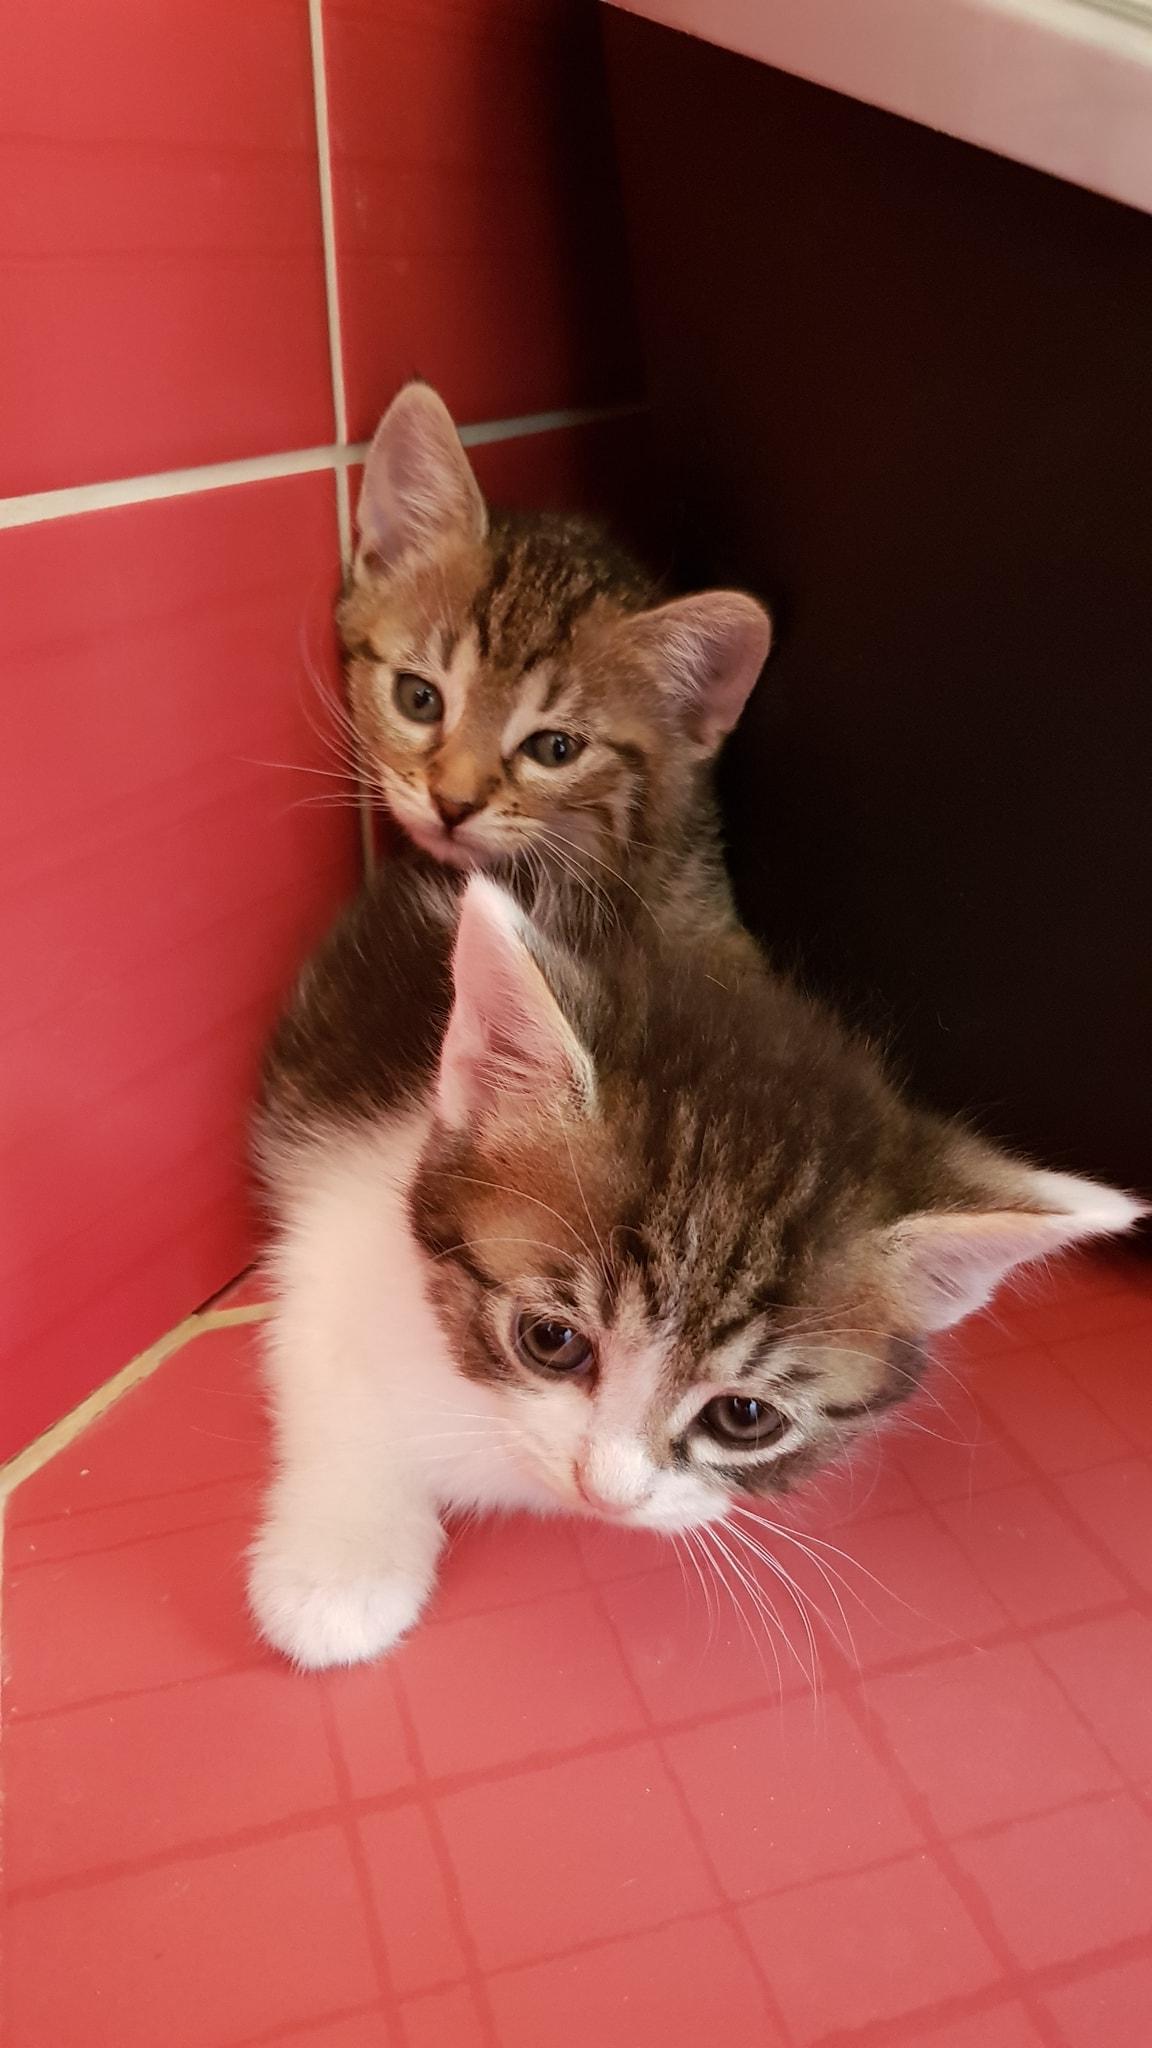 Pěkné těsné kočička obrázky